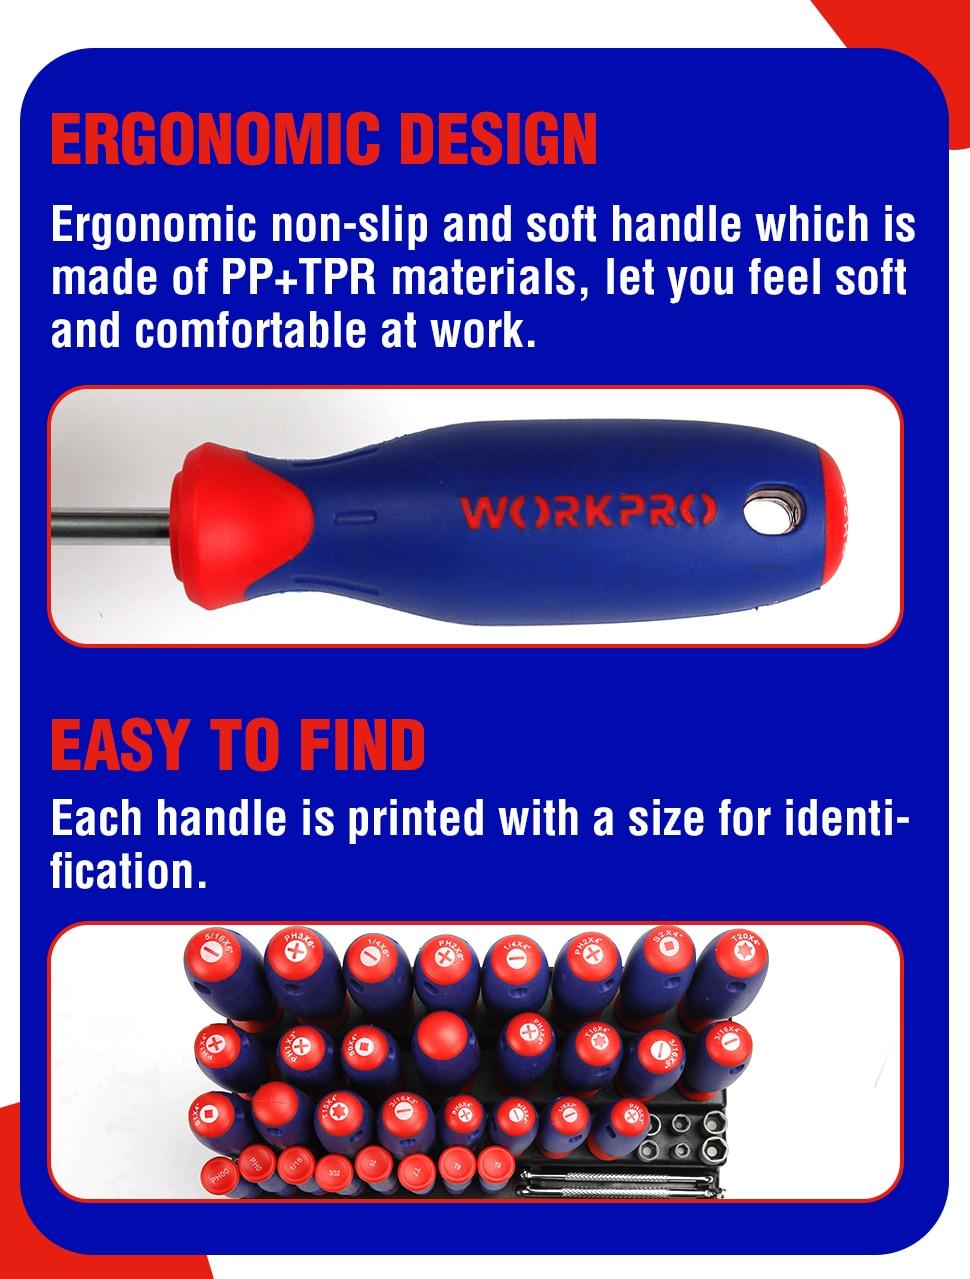 WORKPRO 100PC Screwdriver Set ERGONOMIC Design